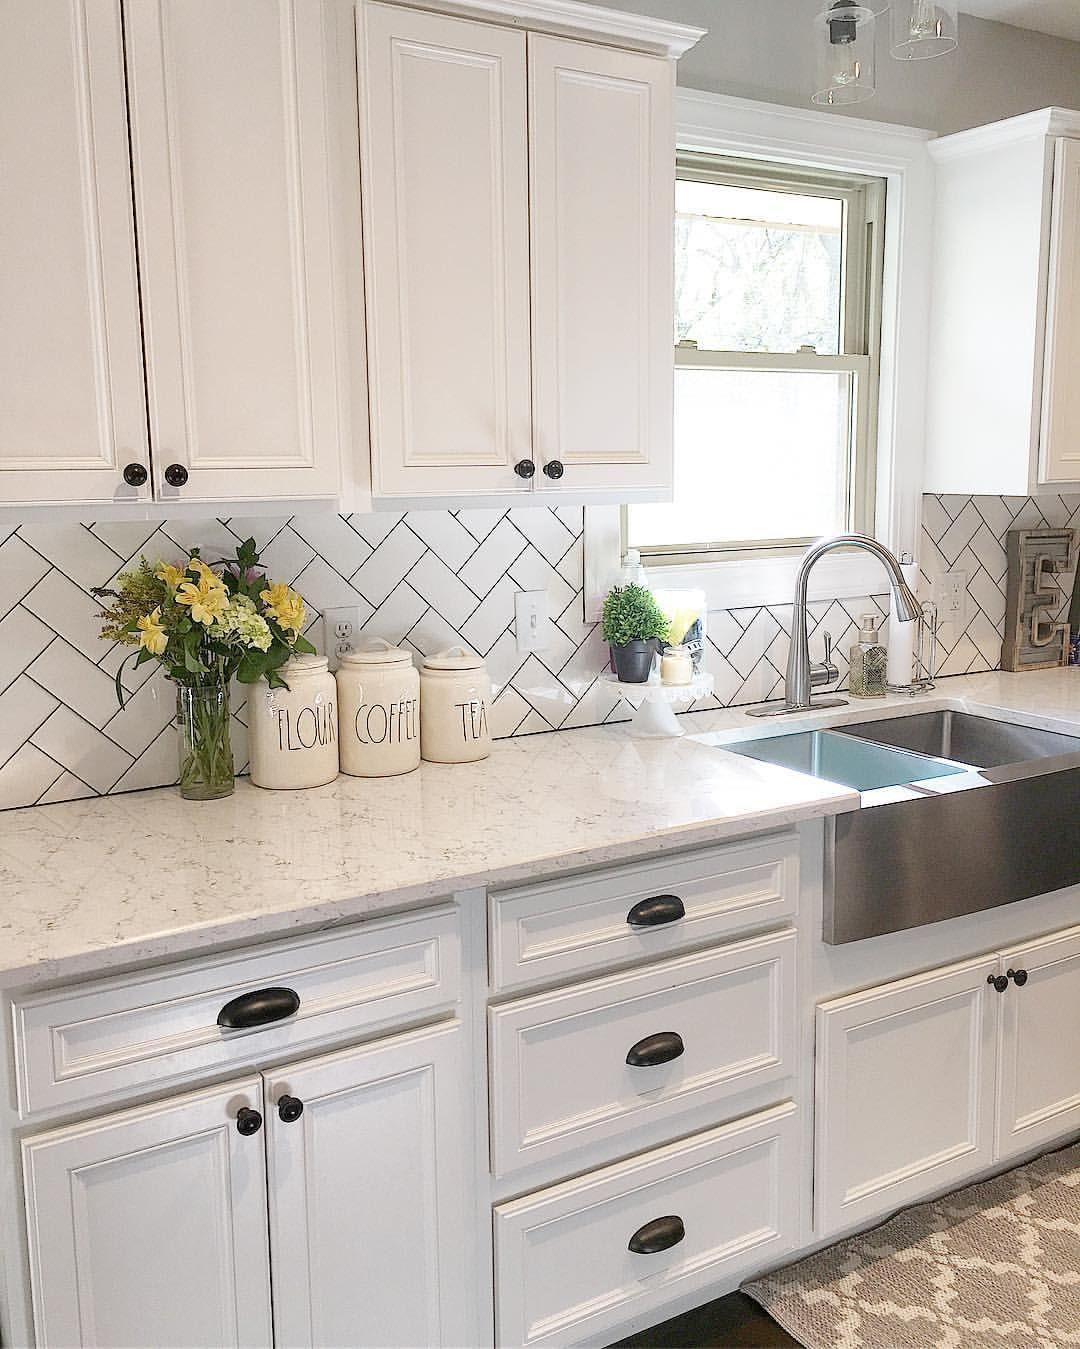 5 Tips On Buying Farmhouse Sink | Apron front sink, Farmhouse ...